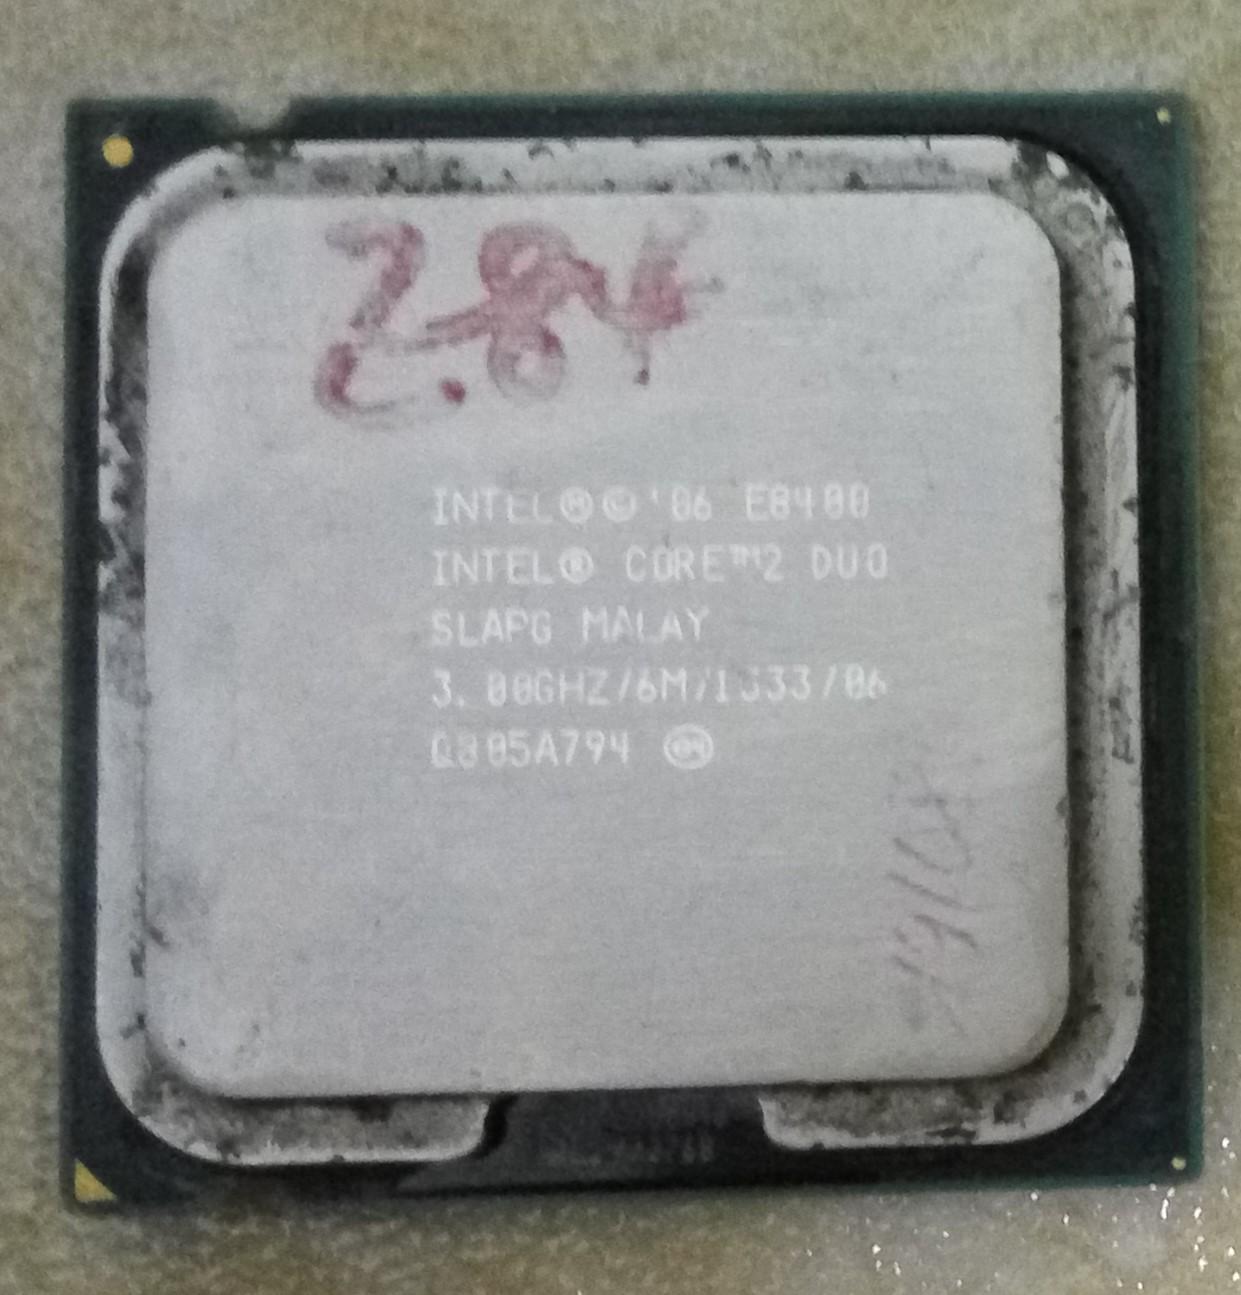 Giá Bộ Xử Lý Intel® Core™2 Duo E8400